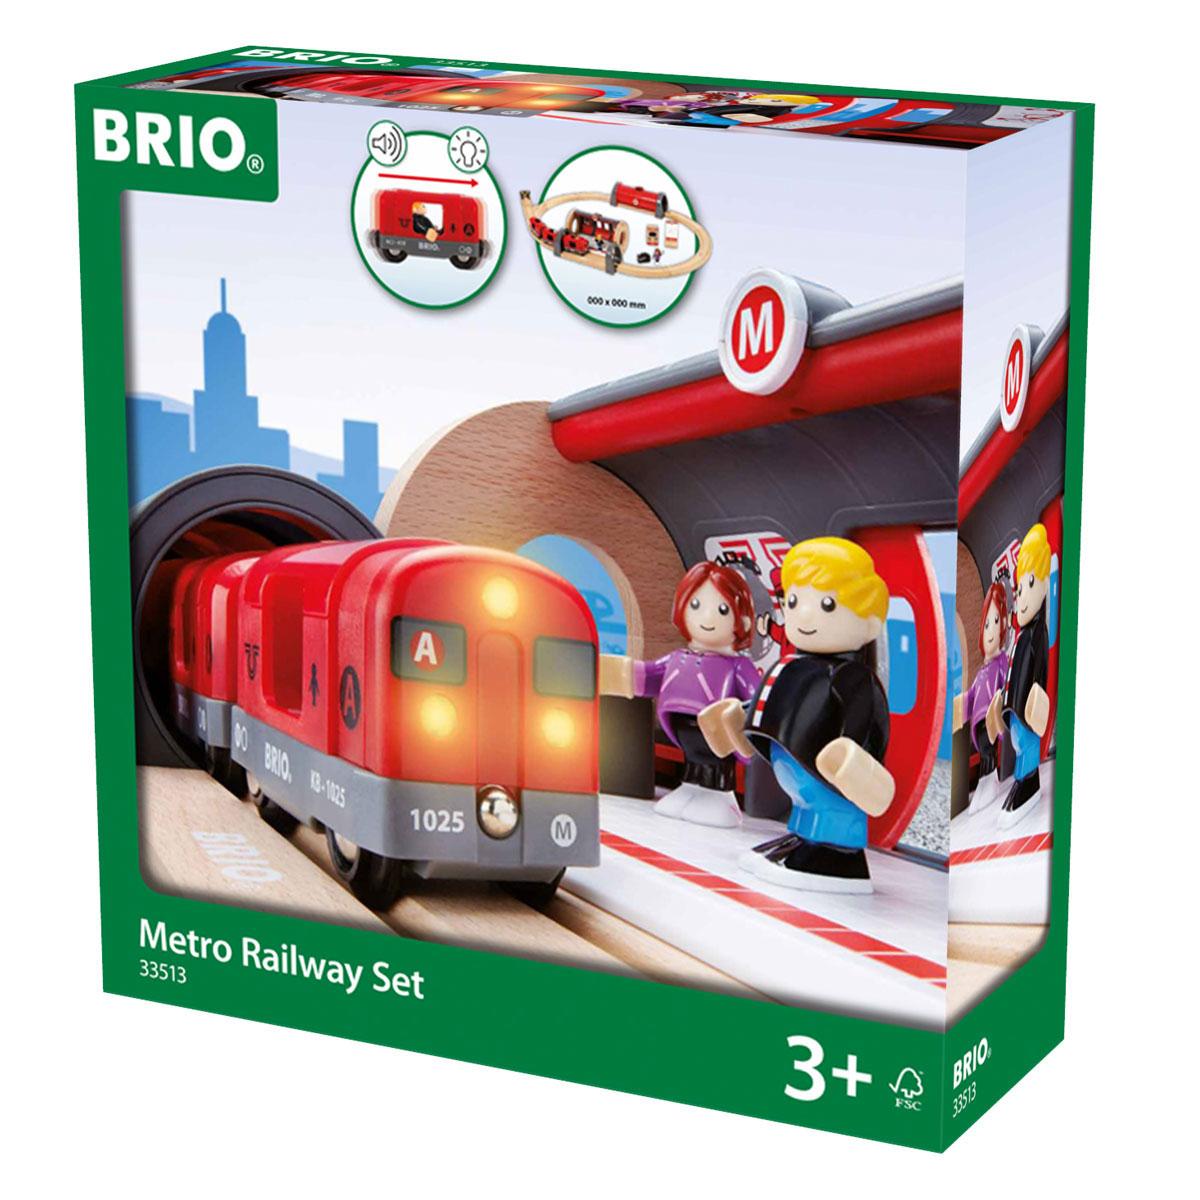 Brio Железная дорога Метро билет на поезд 35 хабаровск благовещенск